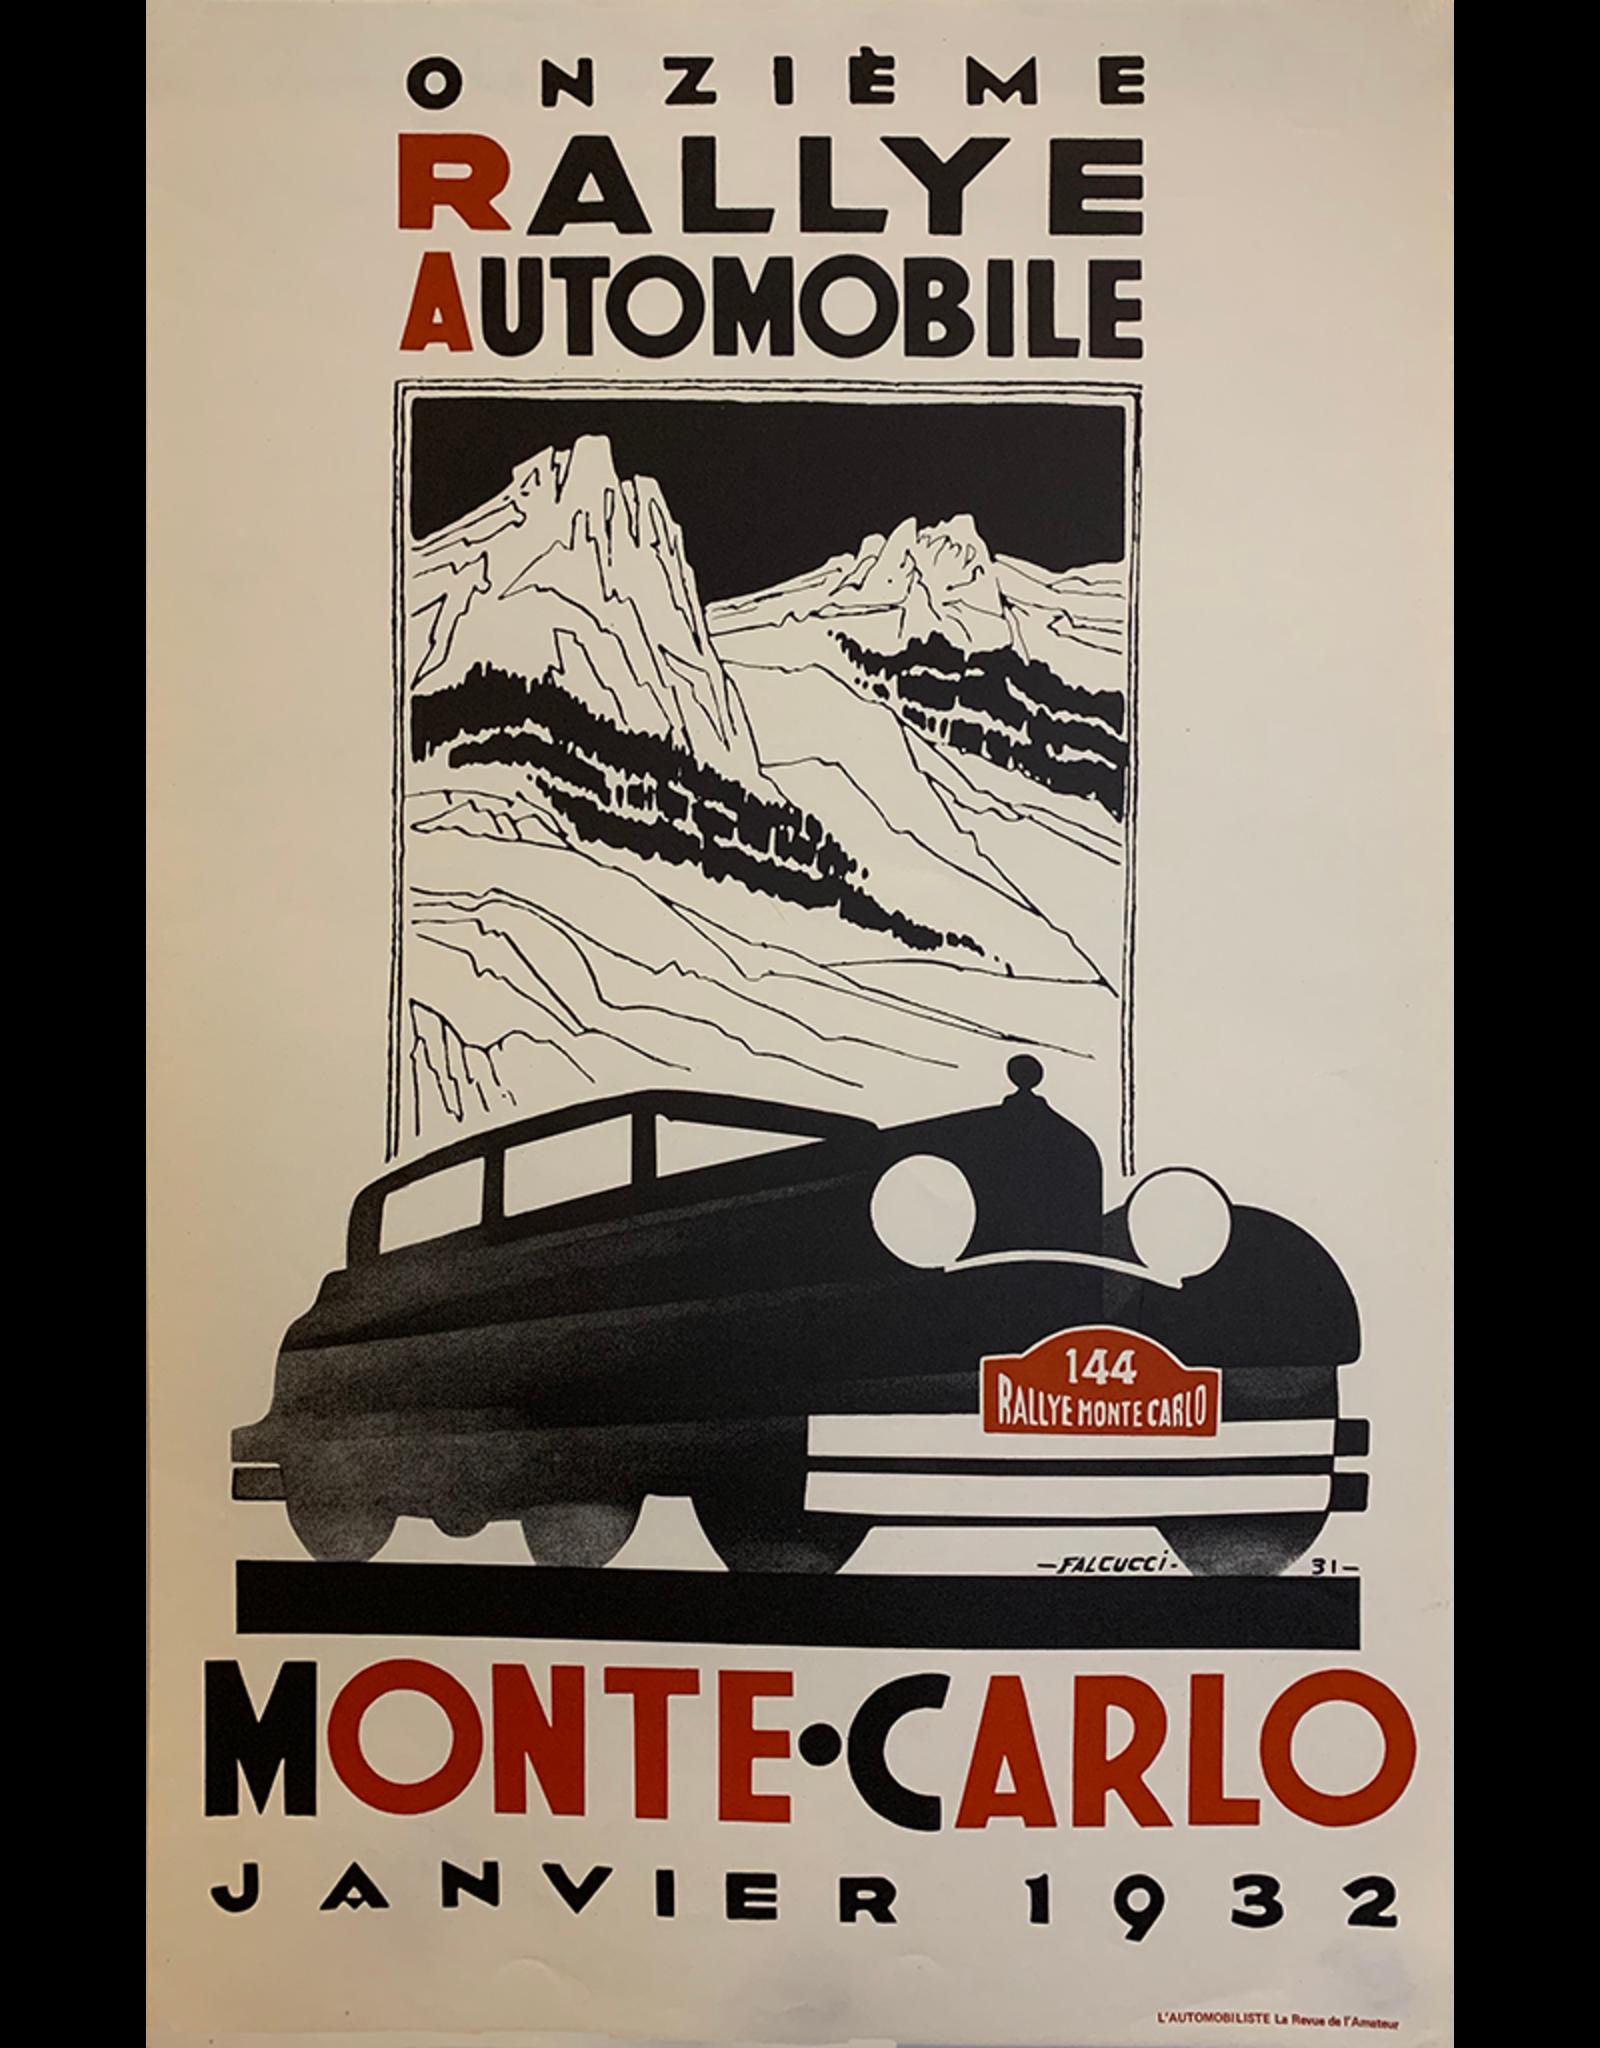 SPV Rallye Automobile Monte Carlo